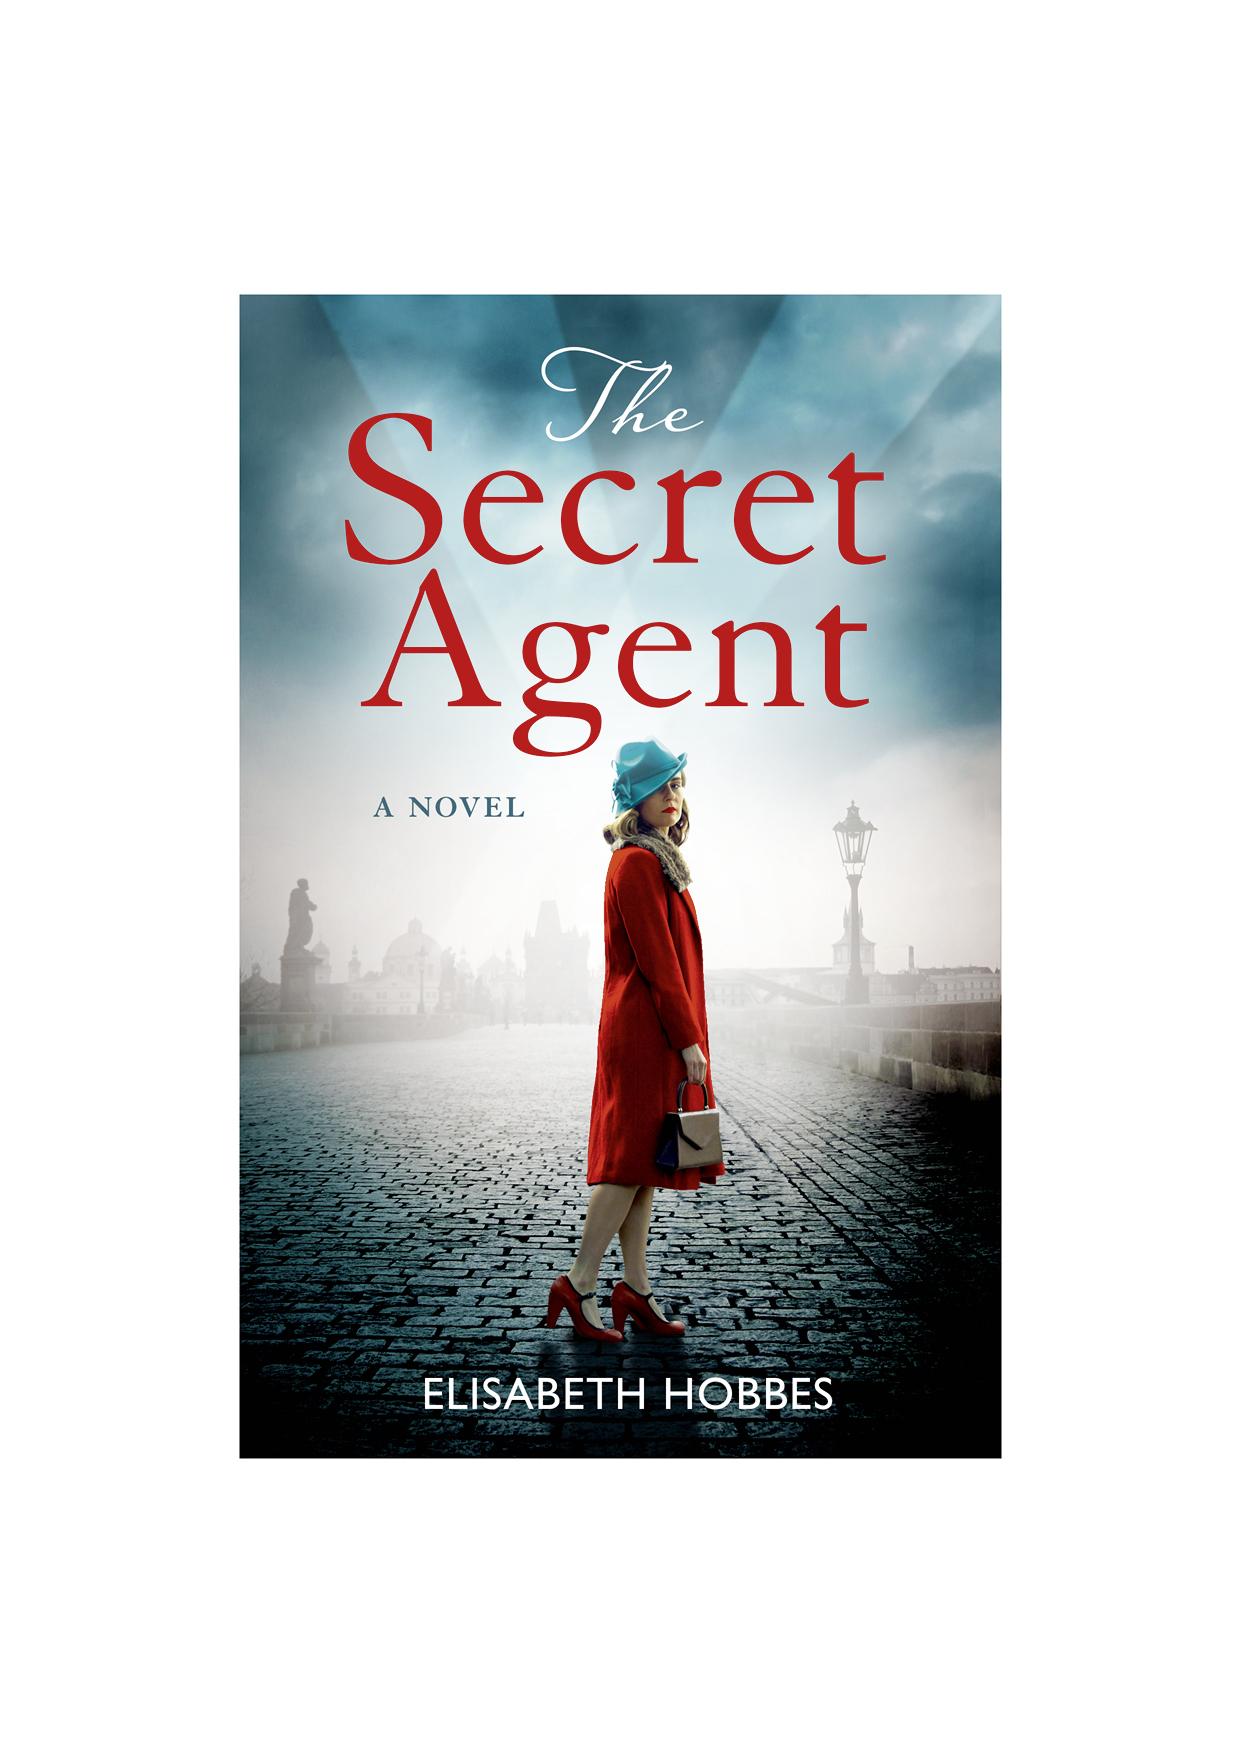 the-secret-agent-can-visuals